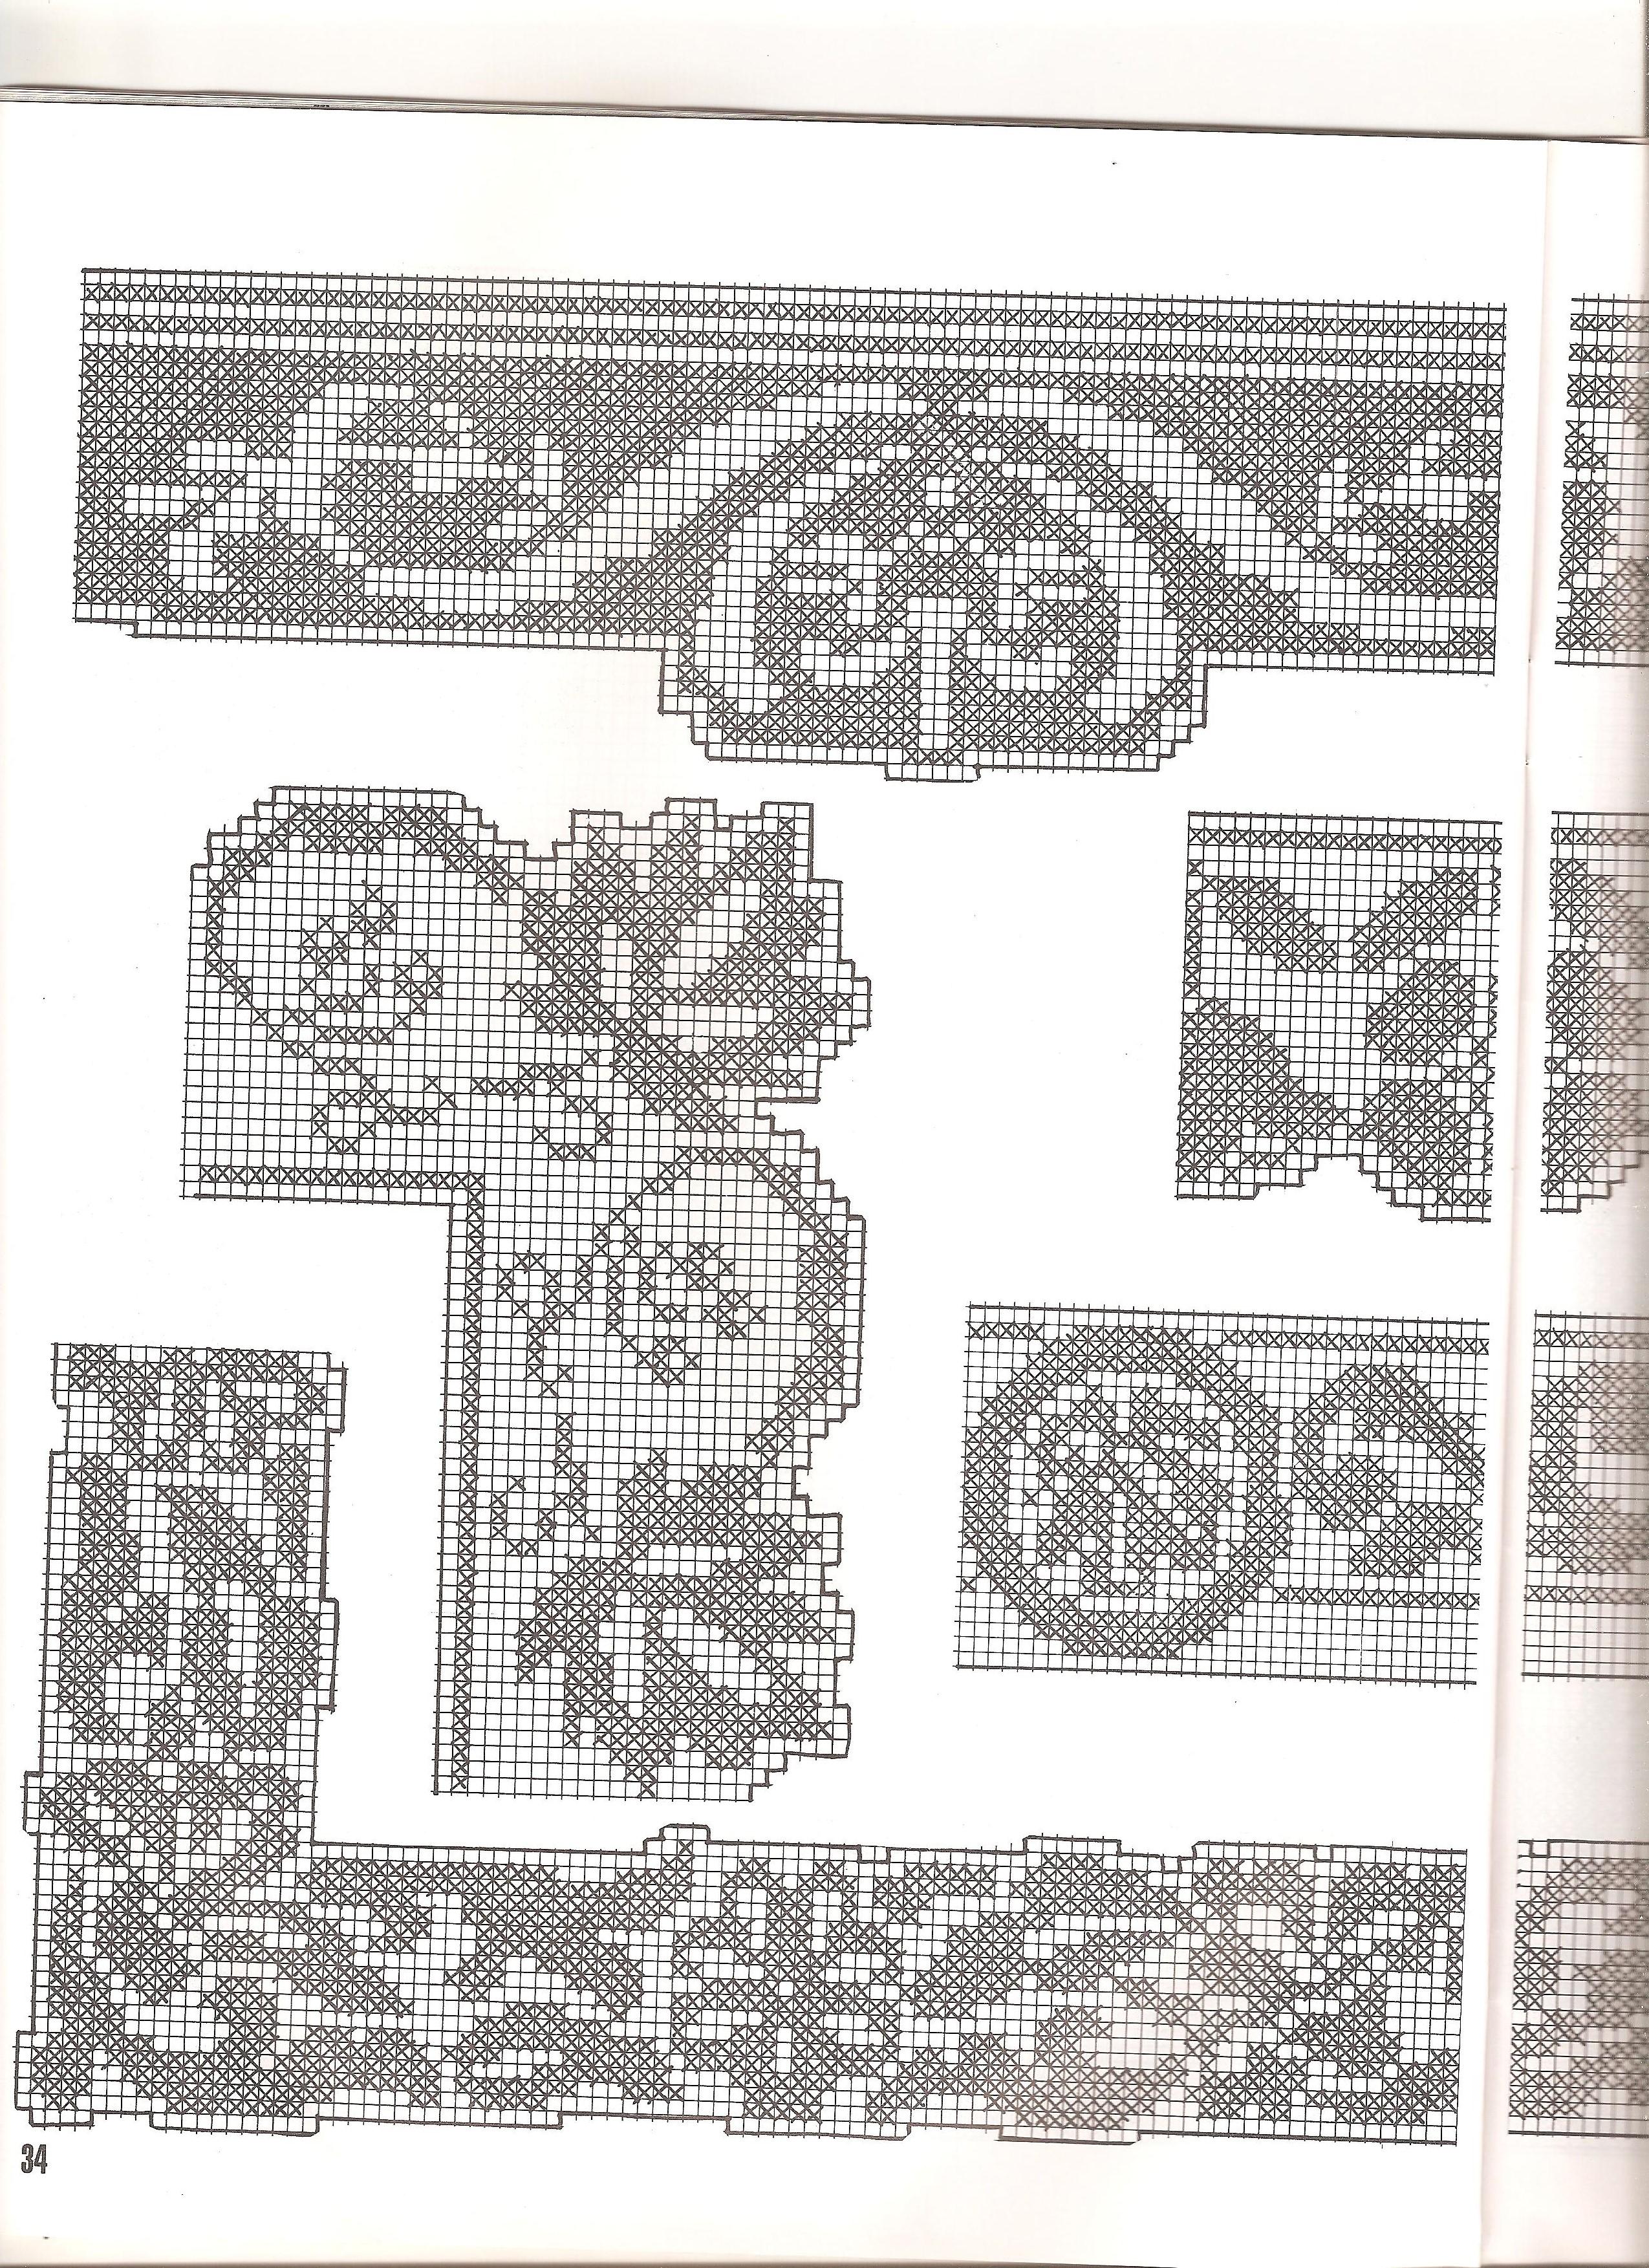 Schemi bordure uncinetto per lenzuola idee creative di for Schemi bordure uncinetto per lenzuola